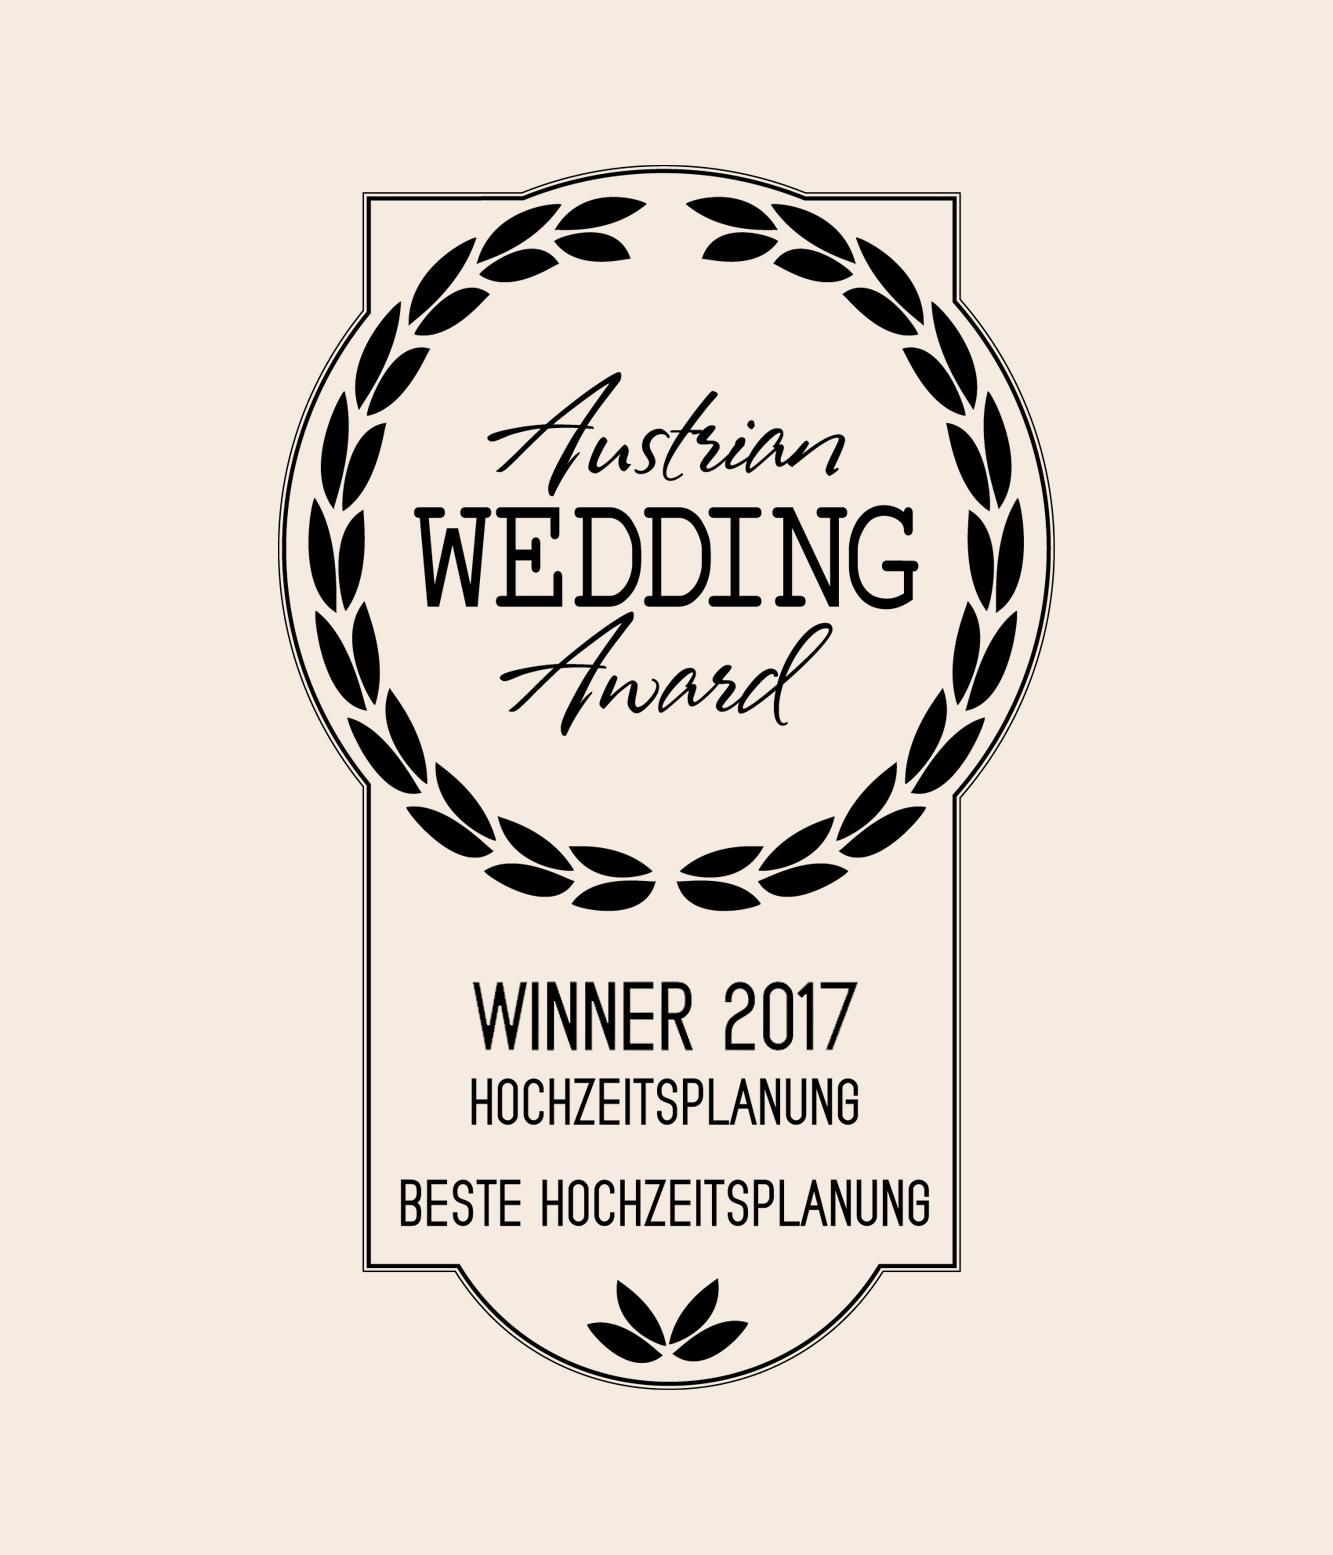 WeddingAward2017